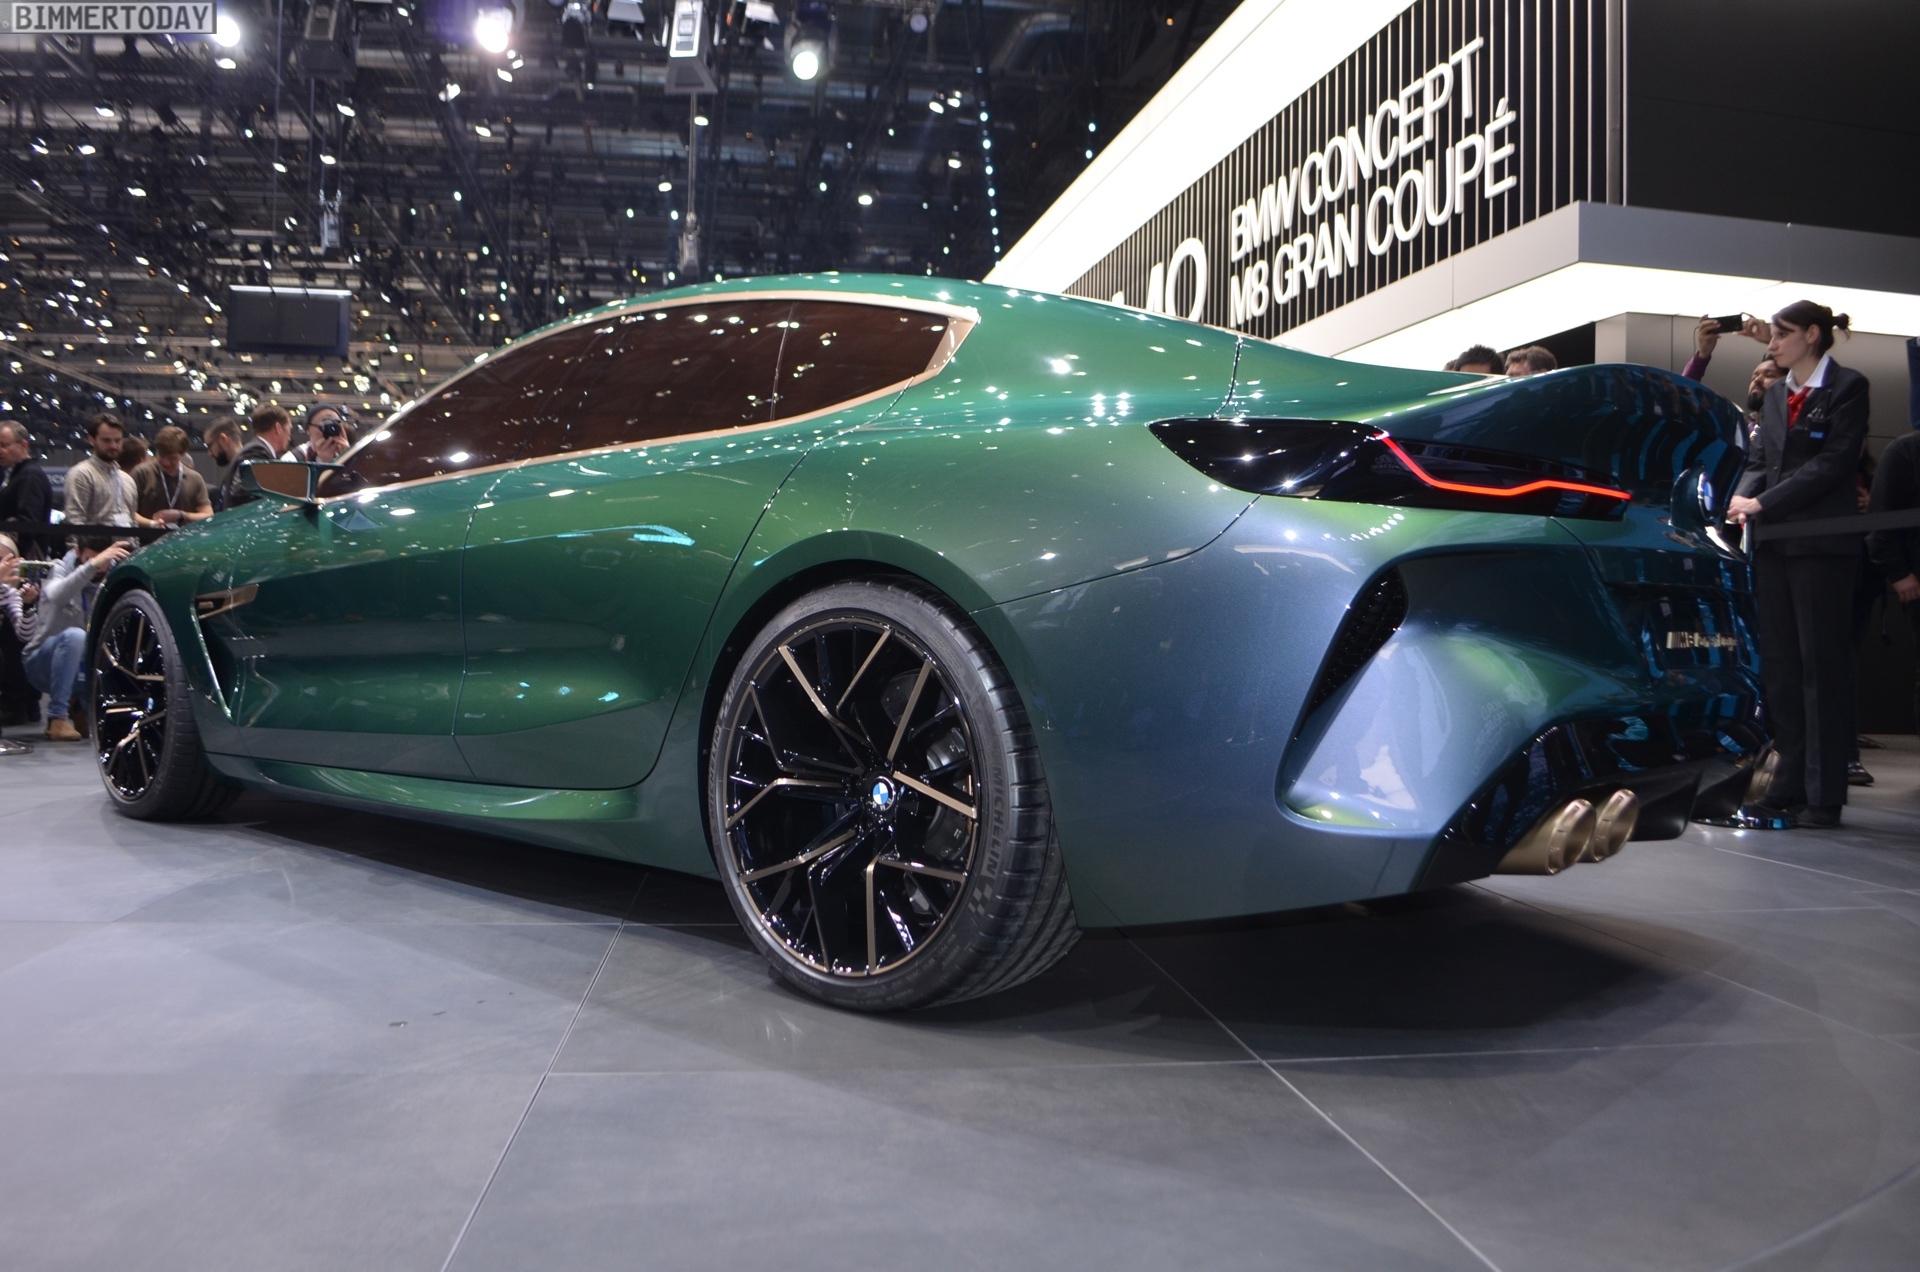 Bmw Concept M8 Gran Coupe Real Life Photos